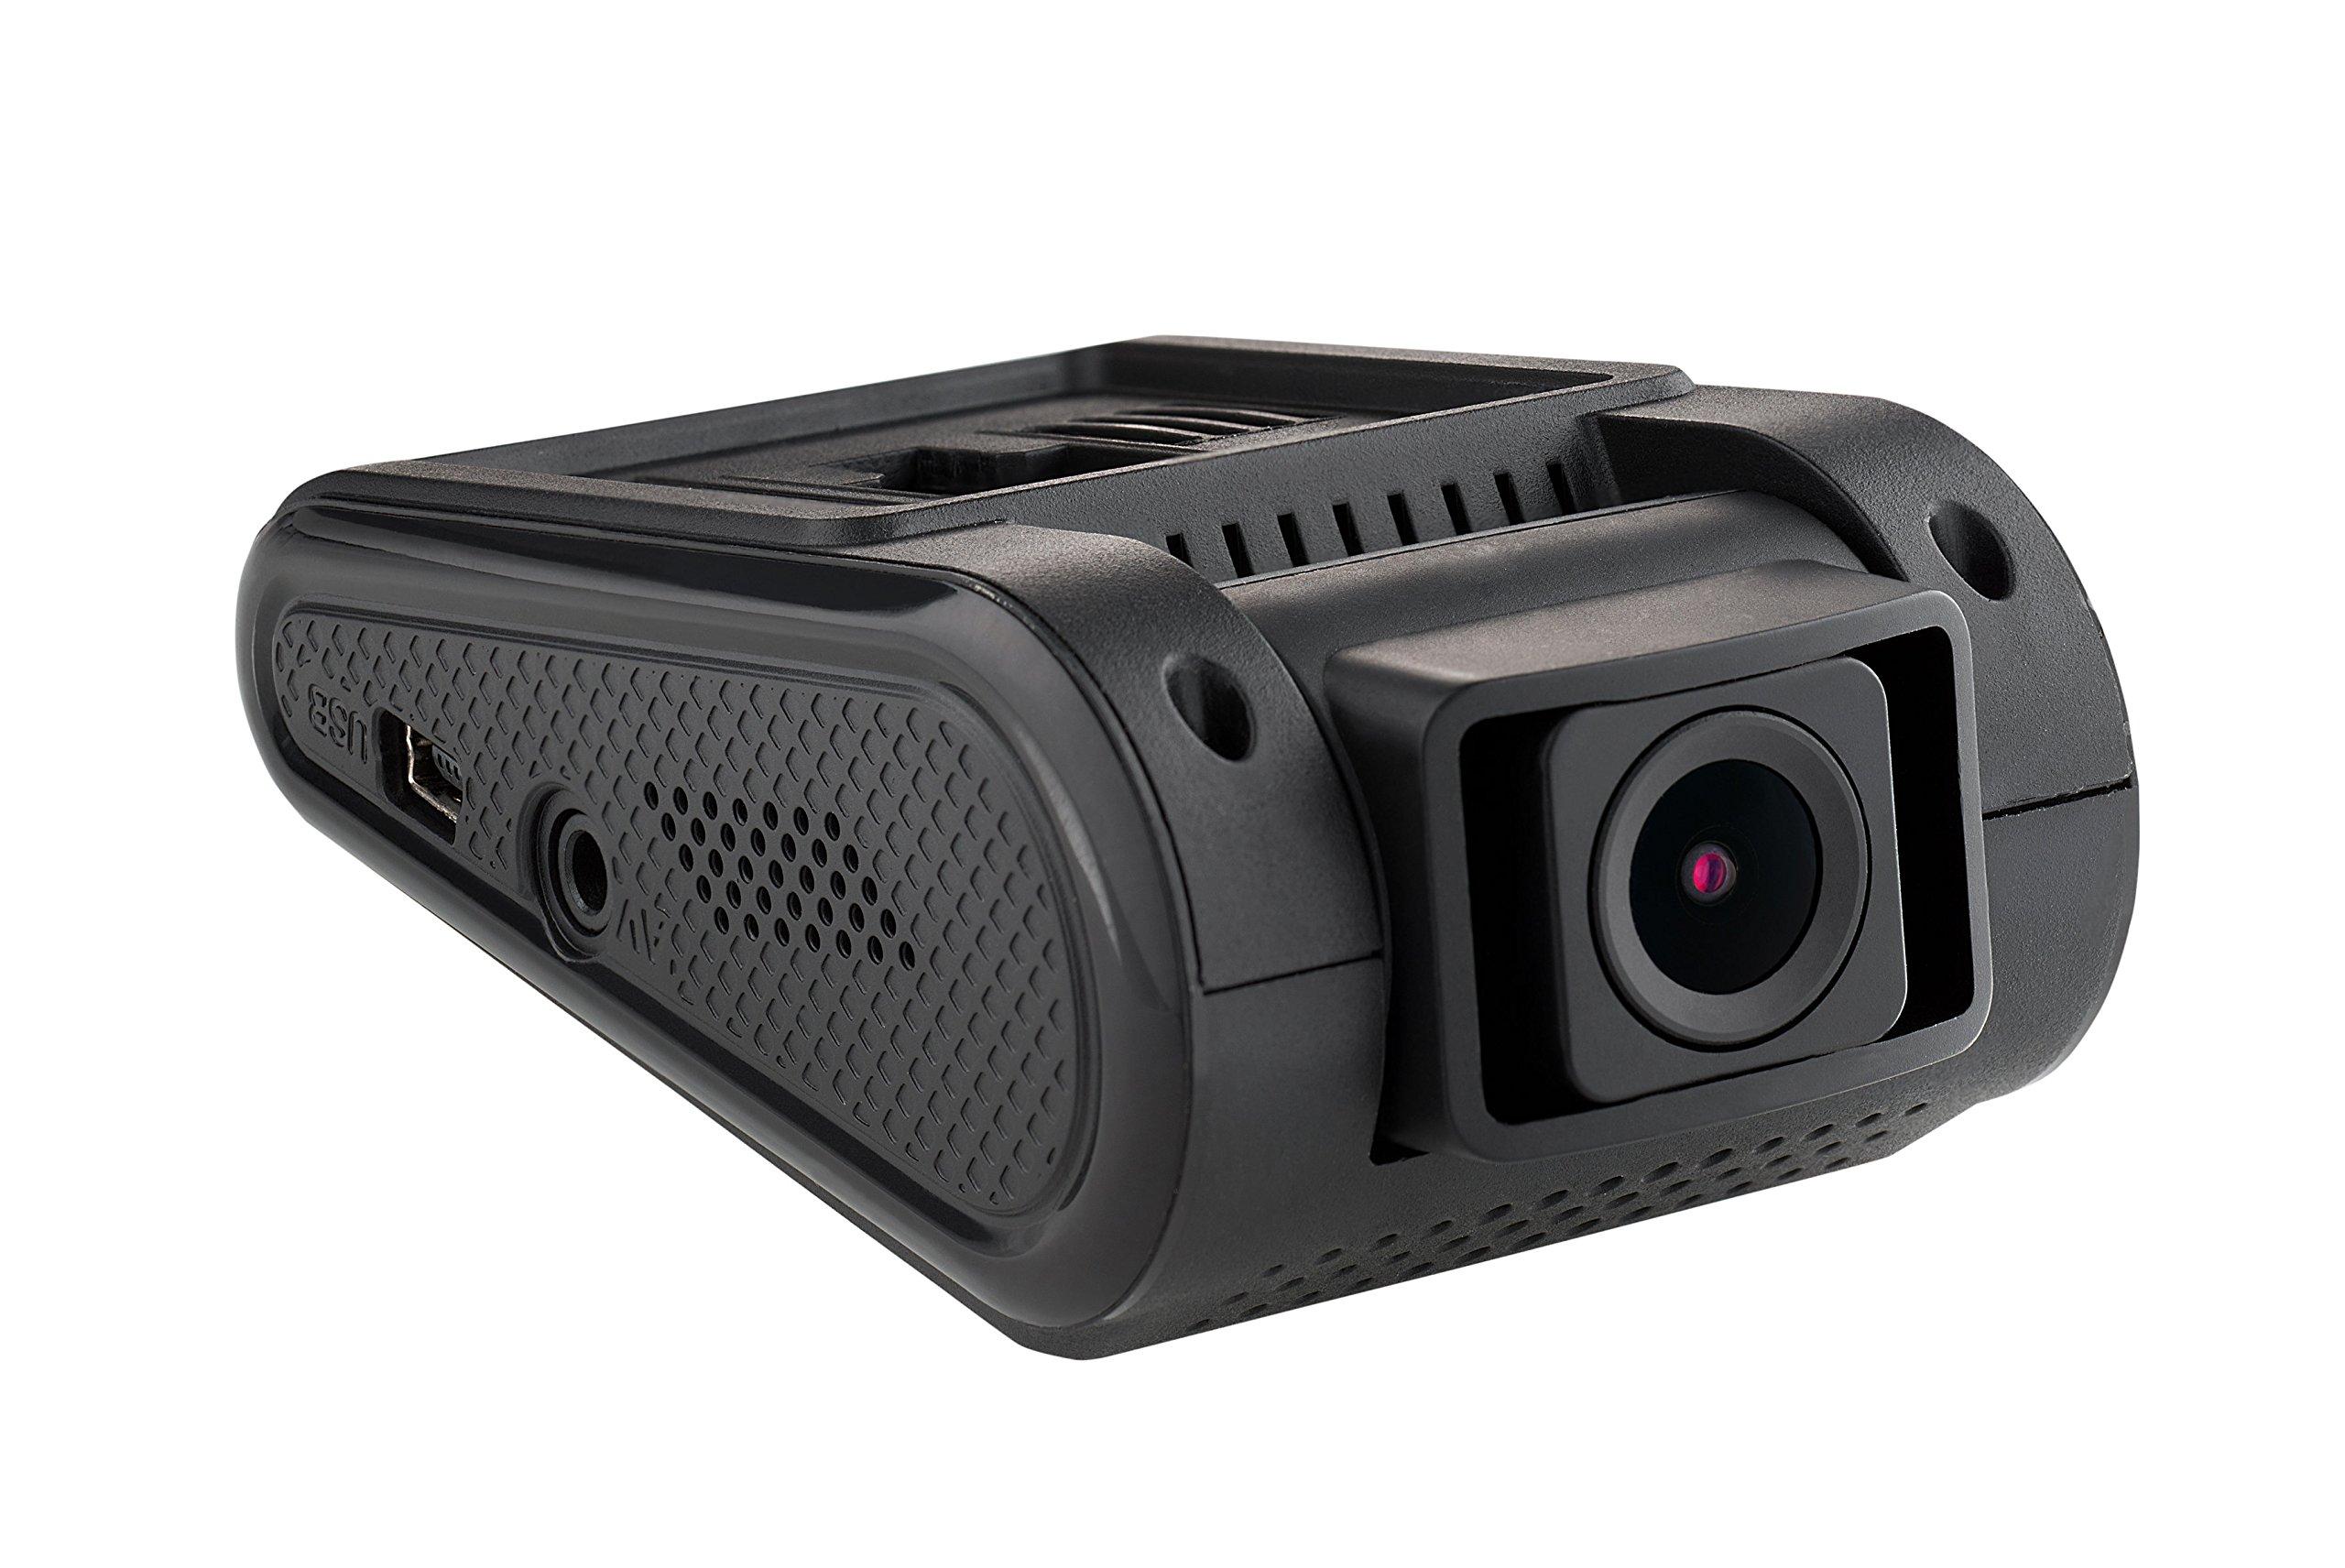 Spy Tec A119 Version 2 Car Dash 60 FPS 1440p Camera with Novate Chipset G Sensor Wide Angle Lens and Low Light Recording